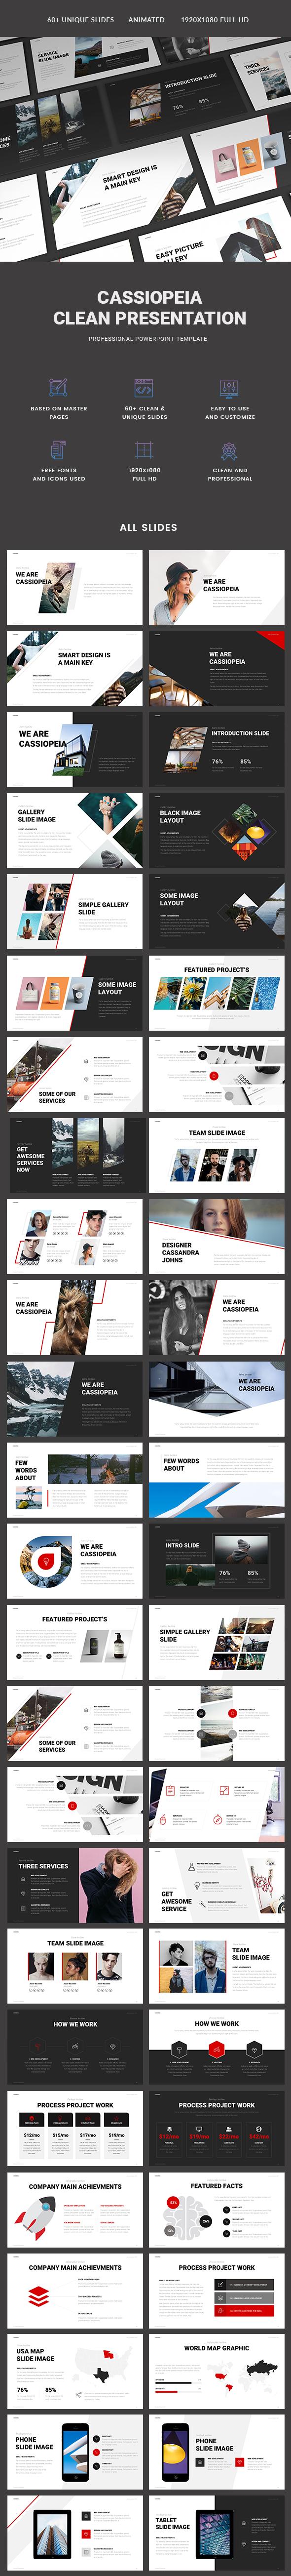 Cassiopeia Presentation - PowerPoint Templates Presentation Templates